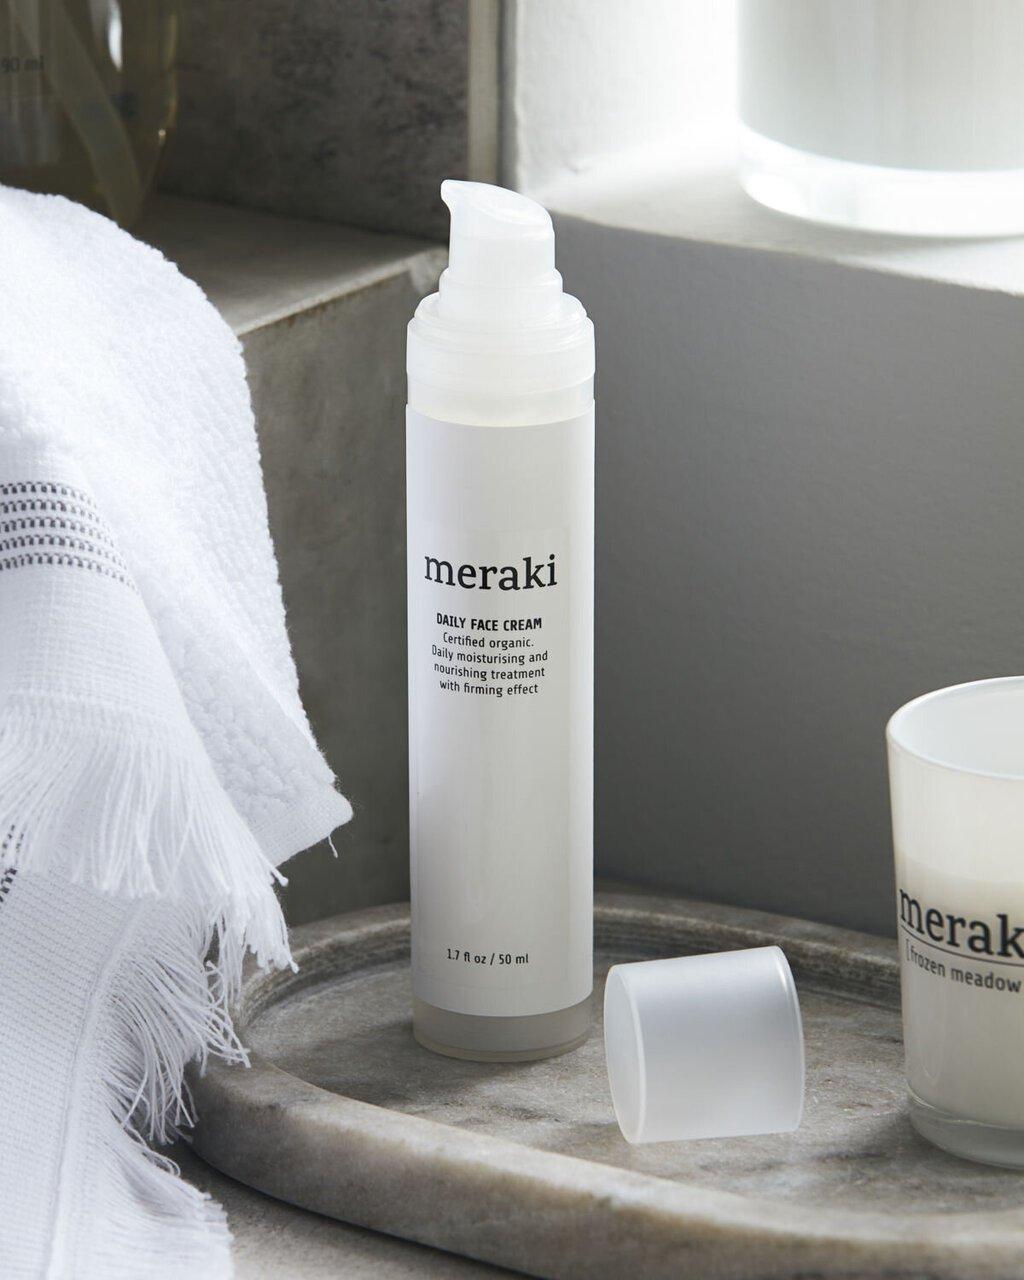 Impressionen zu Meraki Bio Tagescreme Daily Face Cream, Bild 2